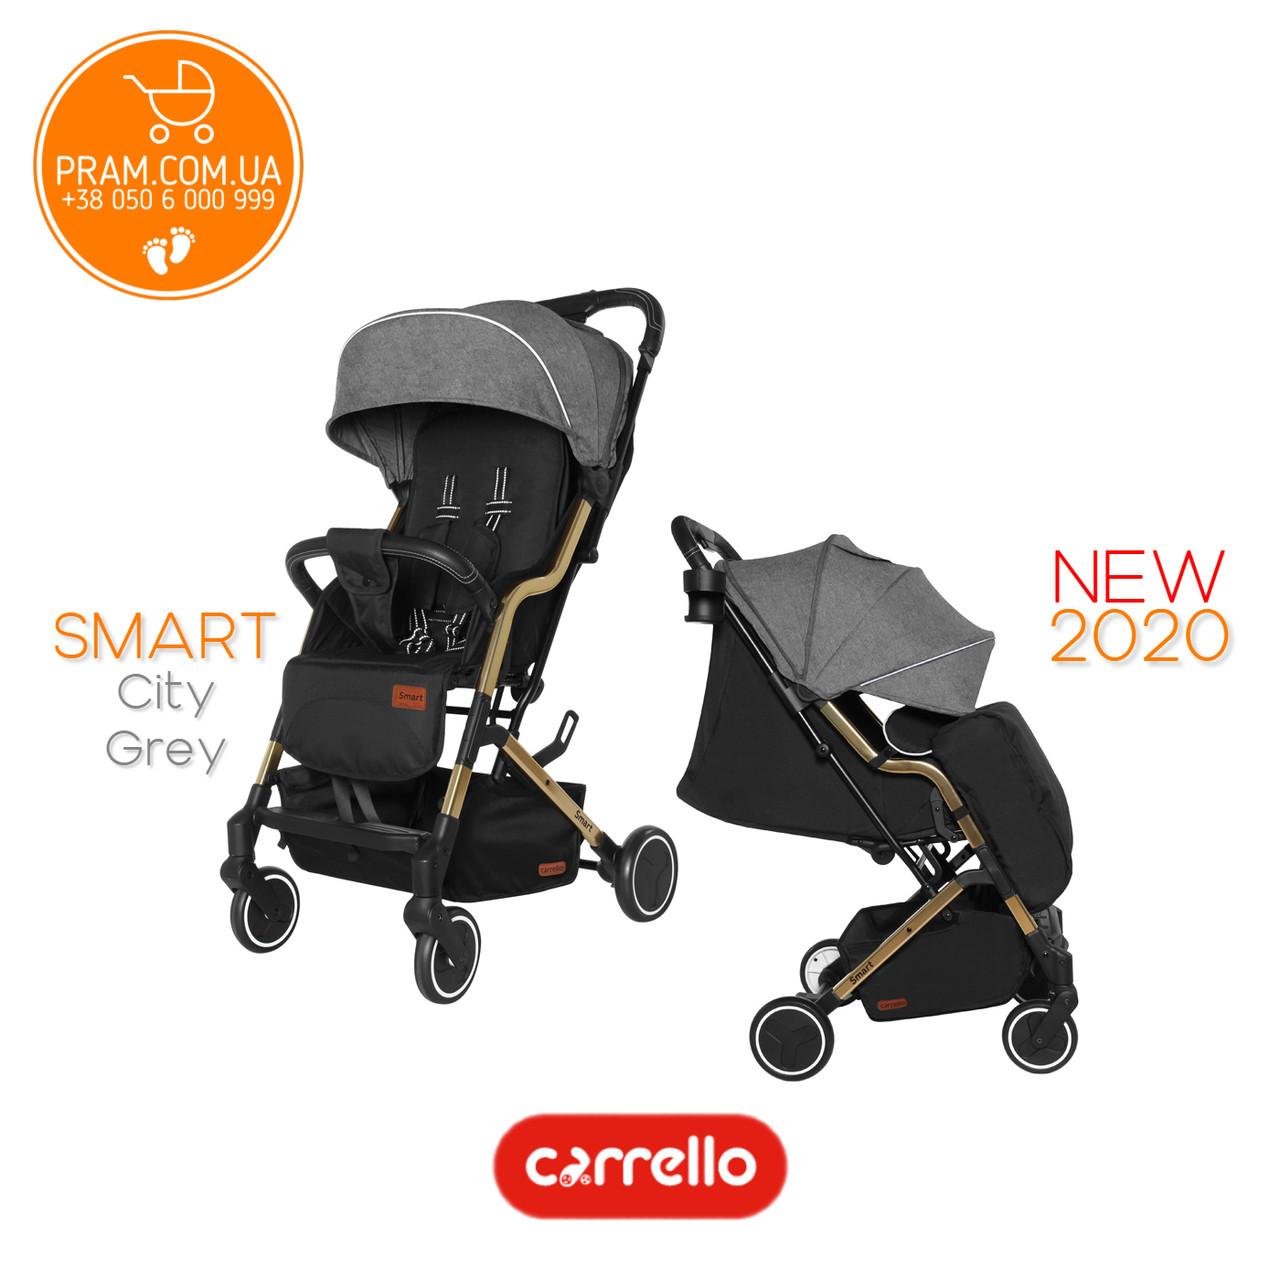 Carrello Smart CRL-5504 прогулочная коляска City Grey Серый